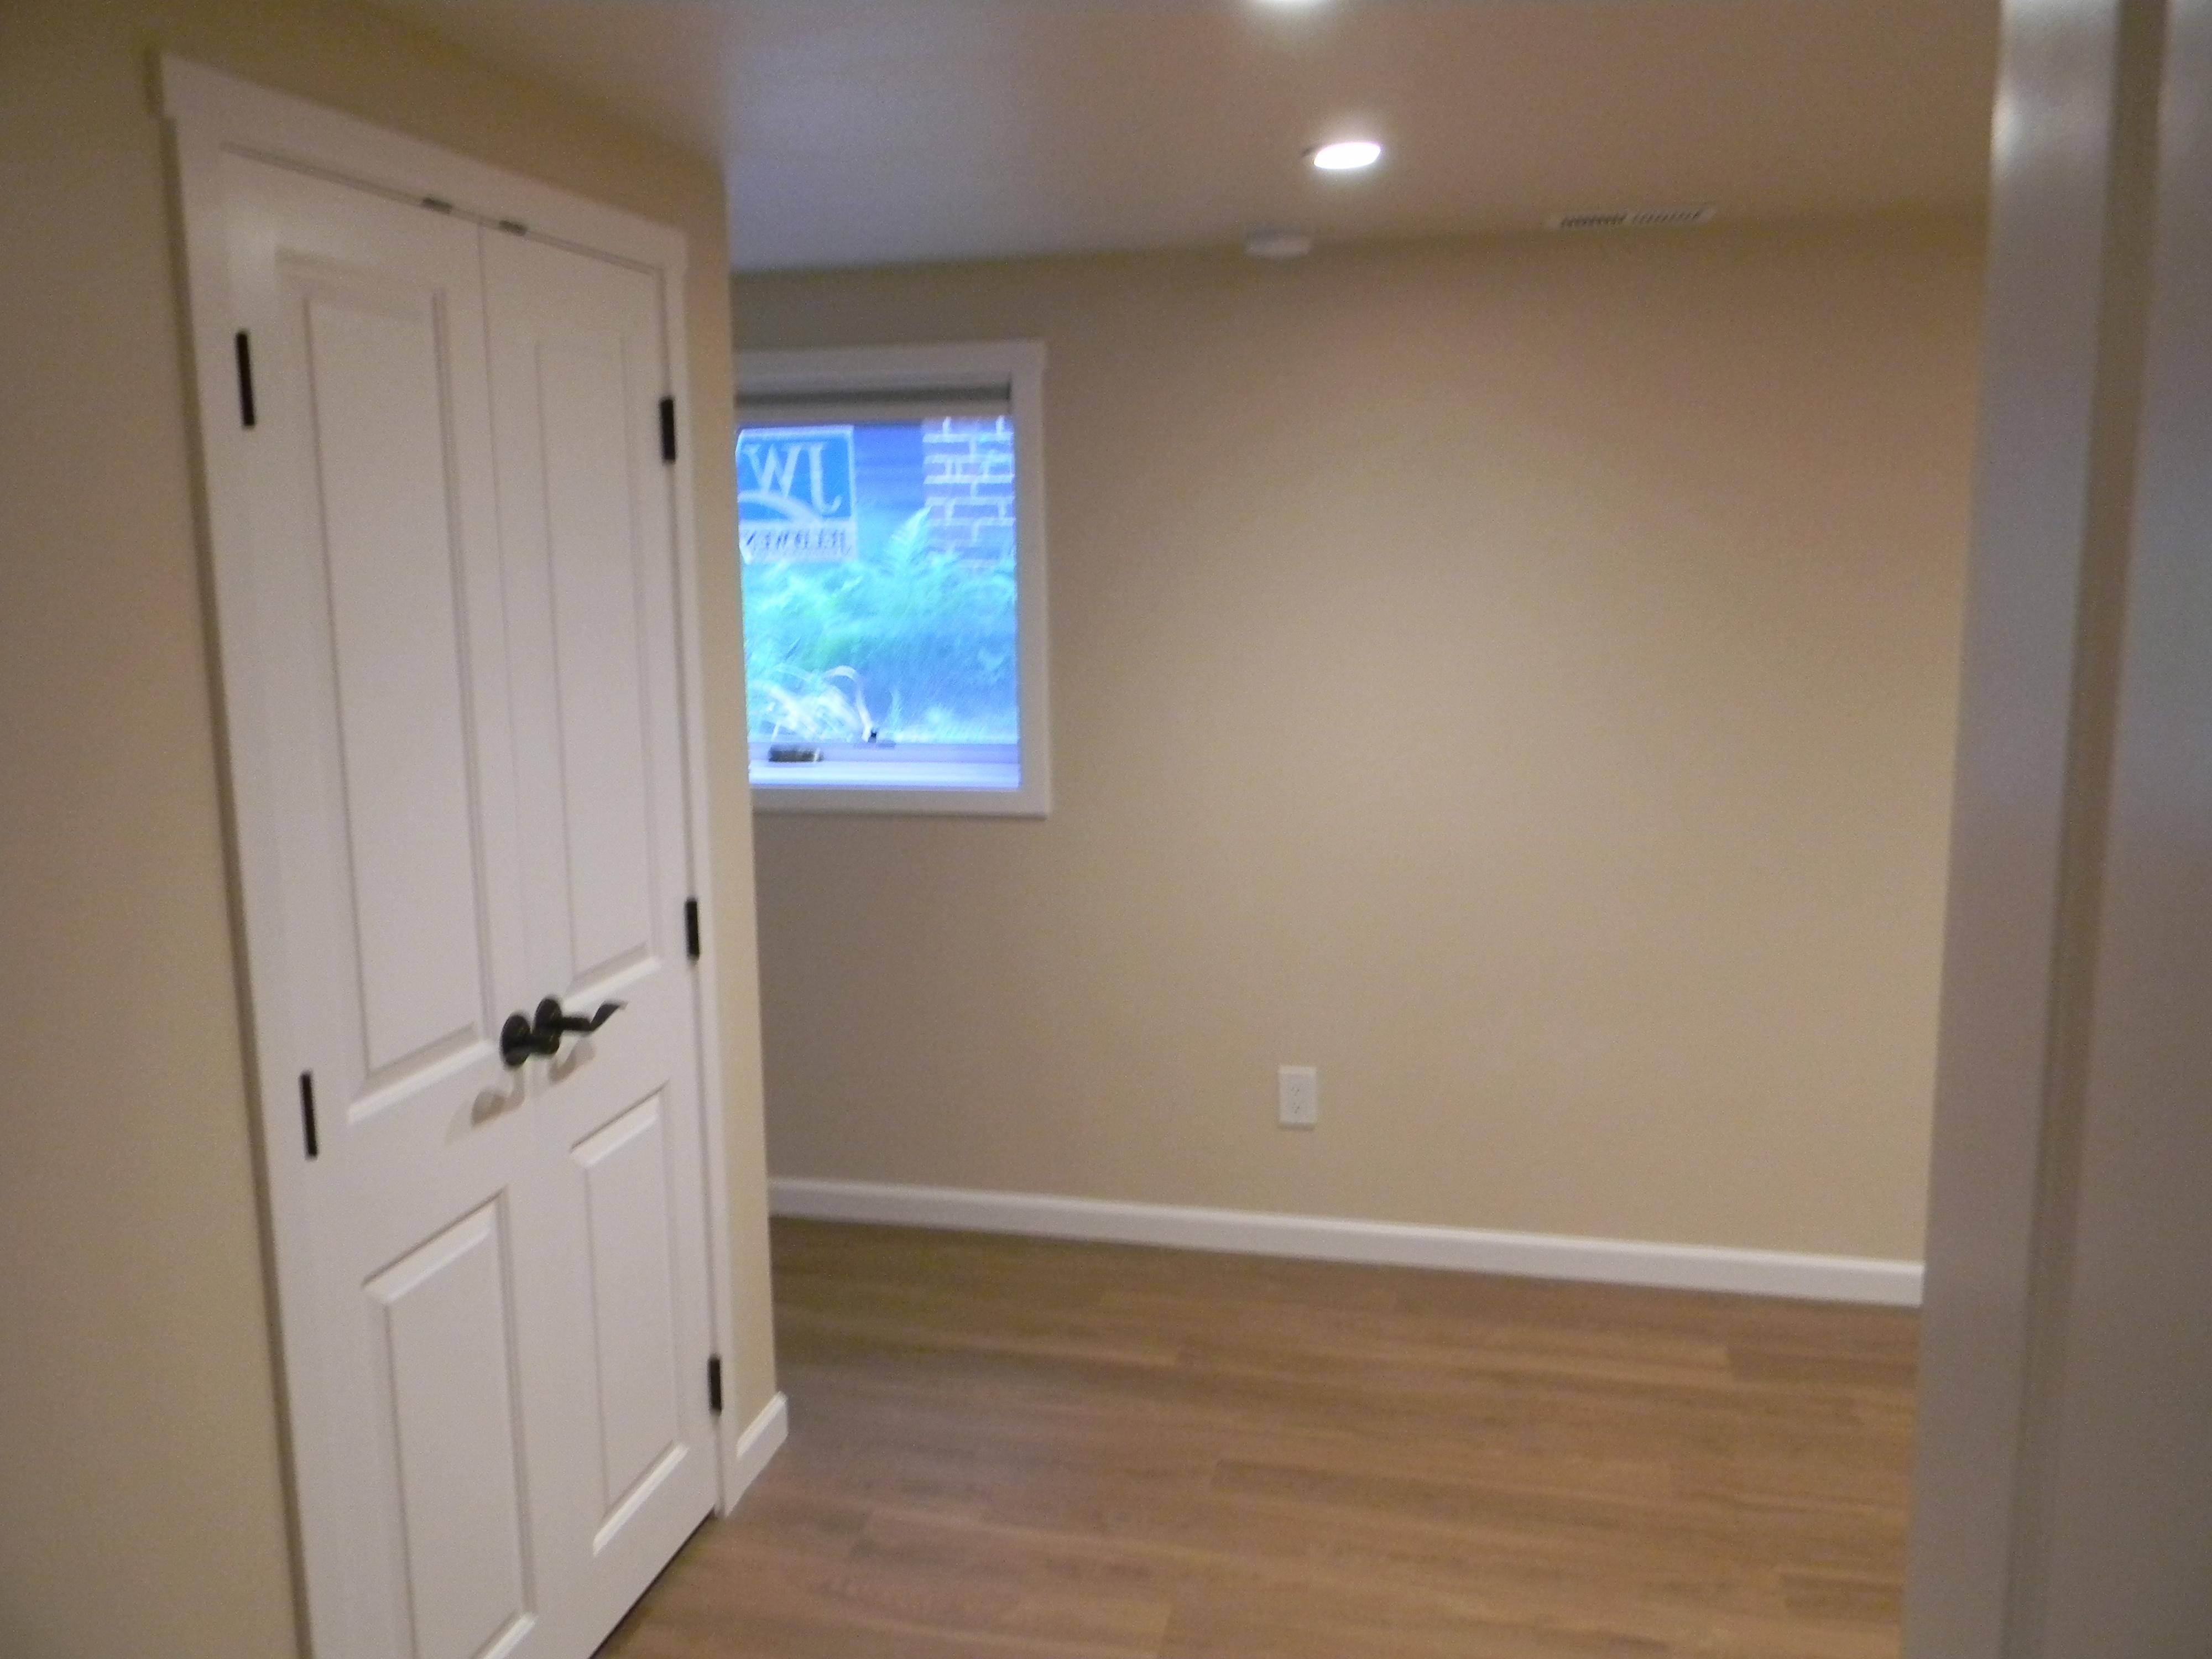 Ken Baune Homes and Remodel image 9